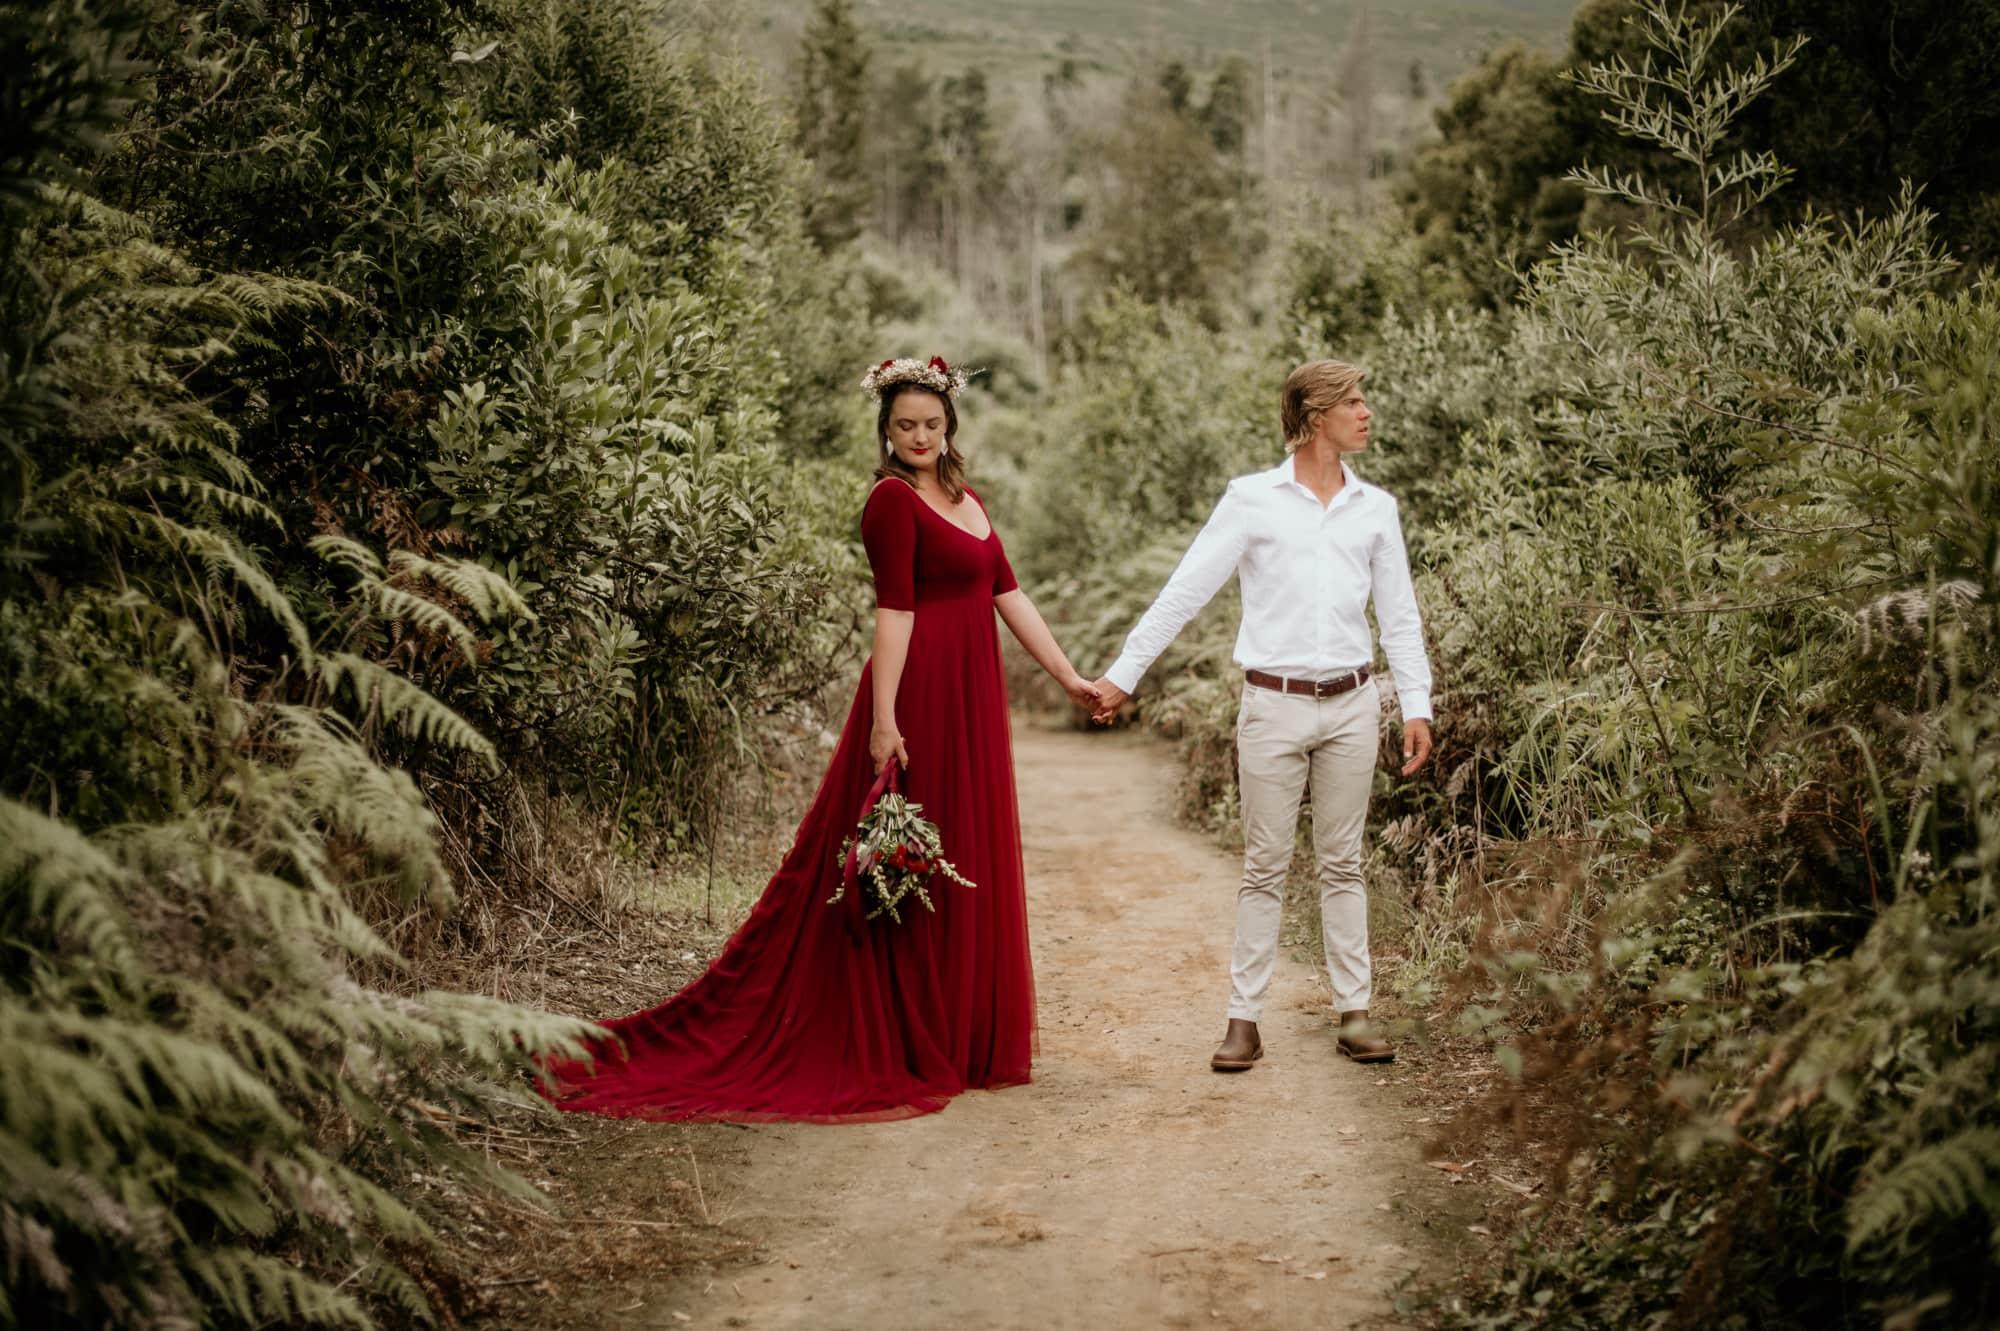 wesley-lanie-george-fernridge-engagement-June-Richards-Photography-Destination-Weddings-Elopements-Garden-Route-13